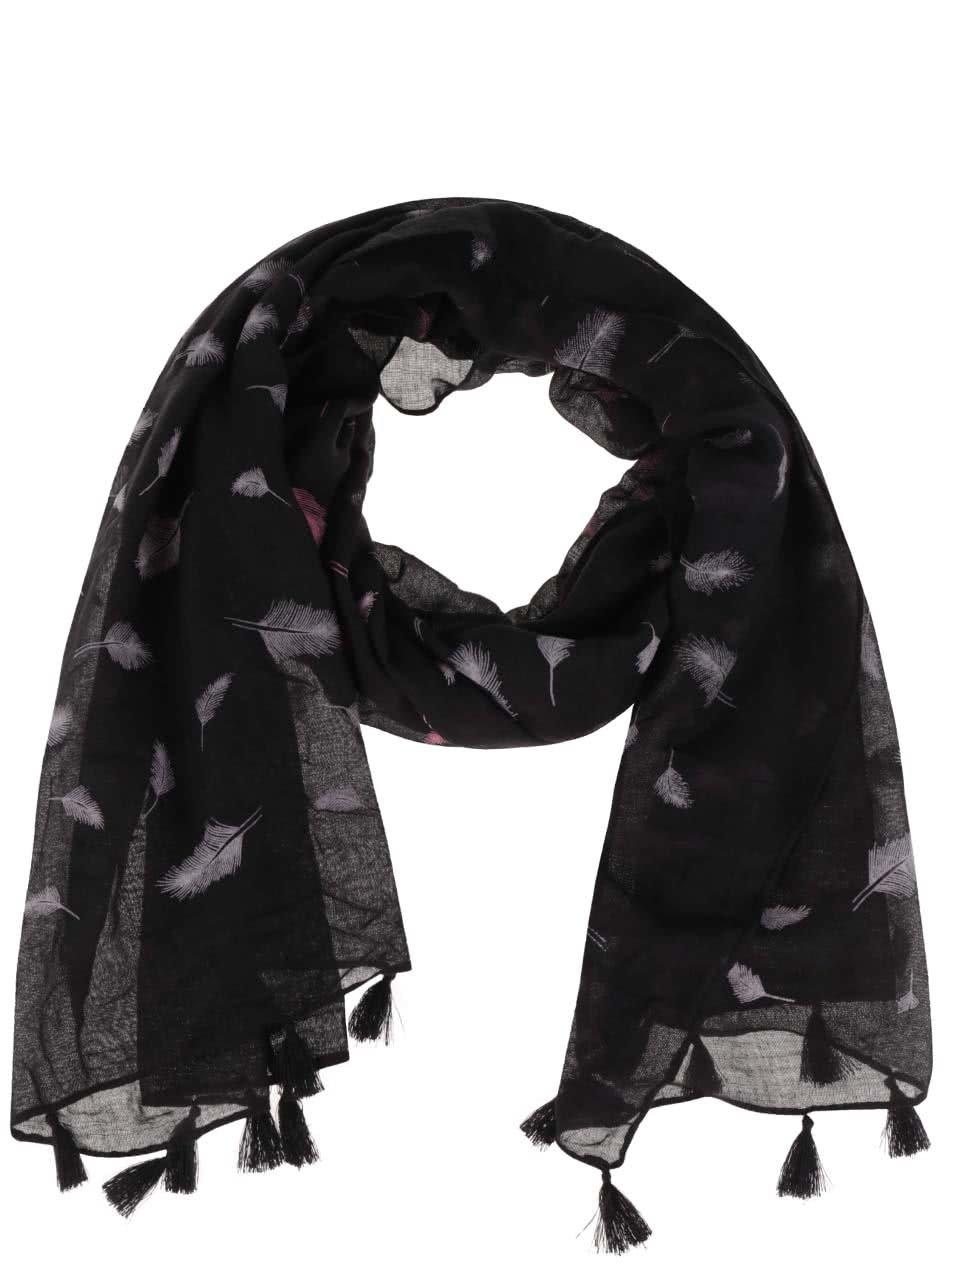 Růžovo-černý šátek s třásněmi a motivem pírek Haily´s Liliana